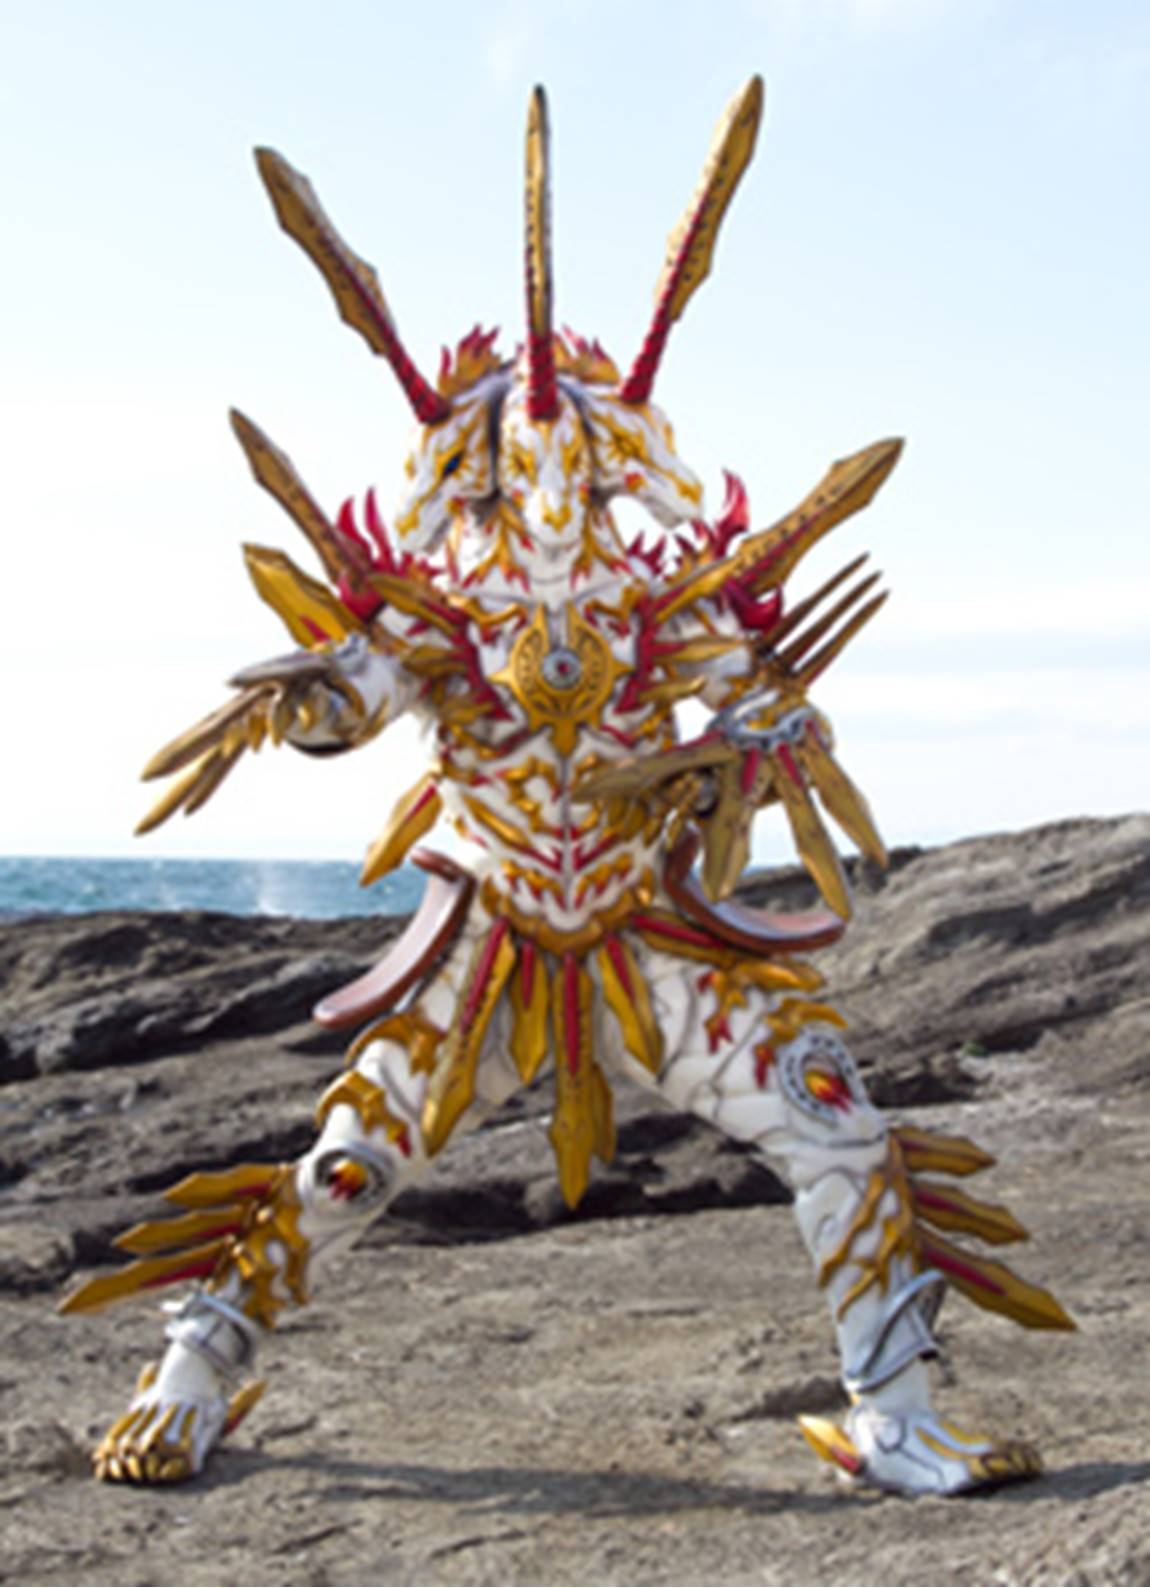 Bari-Boru-Dara of the Uniberus Headder